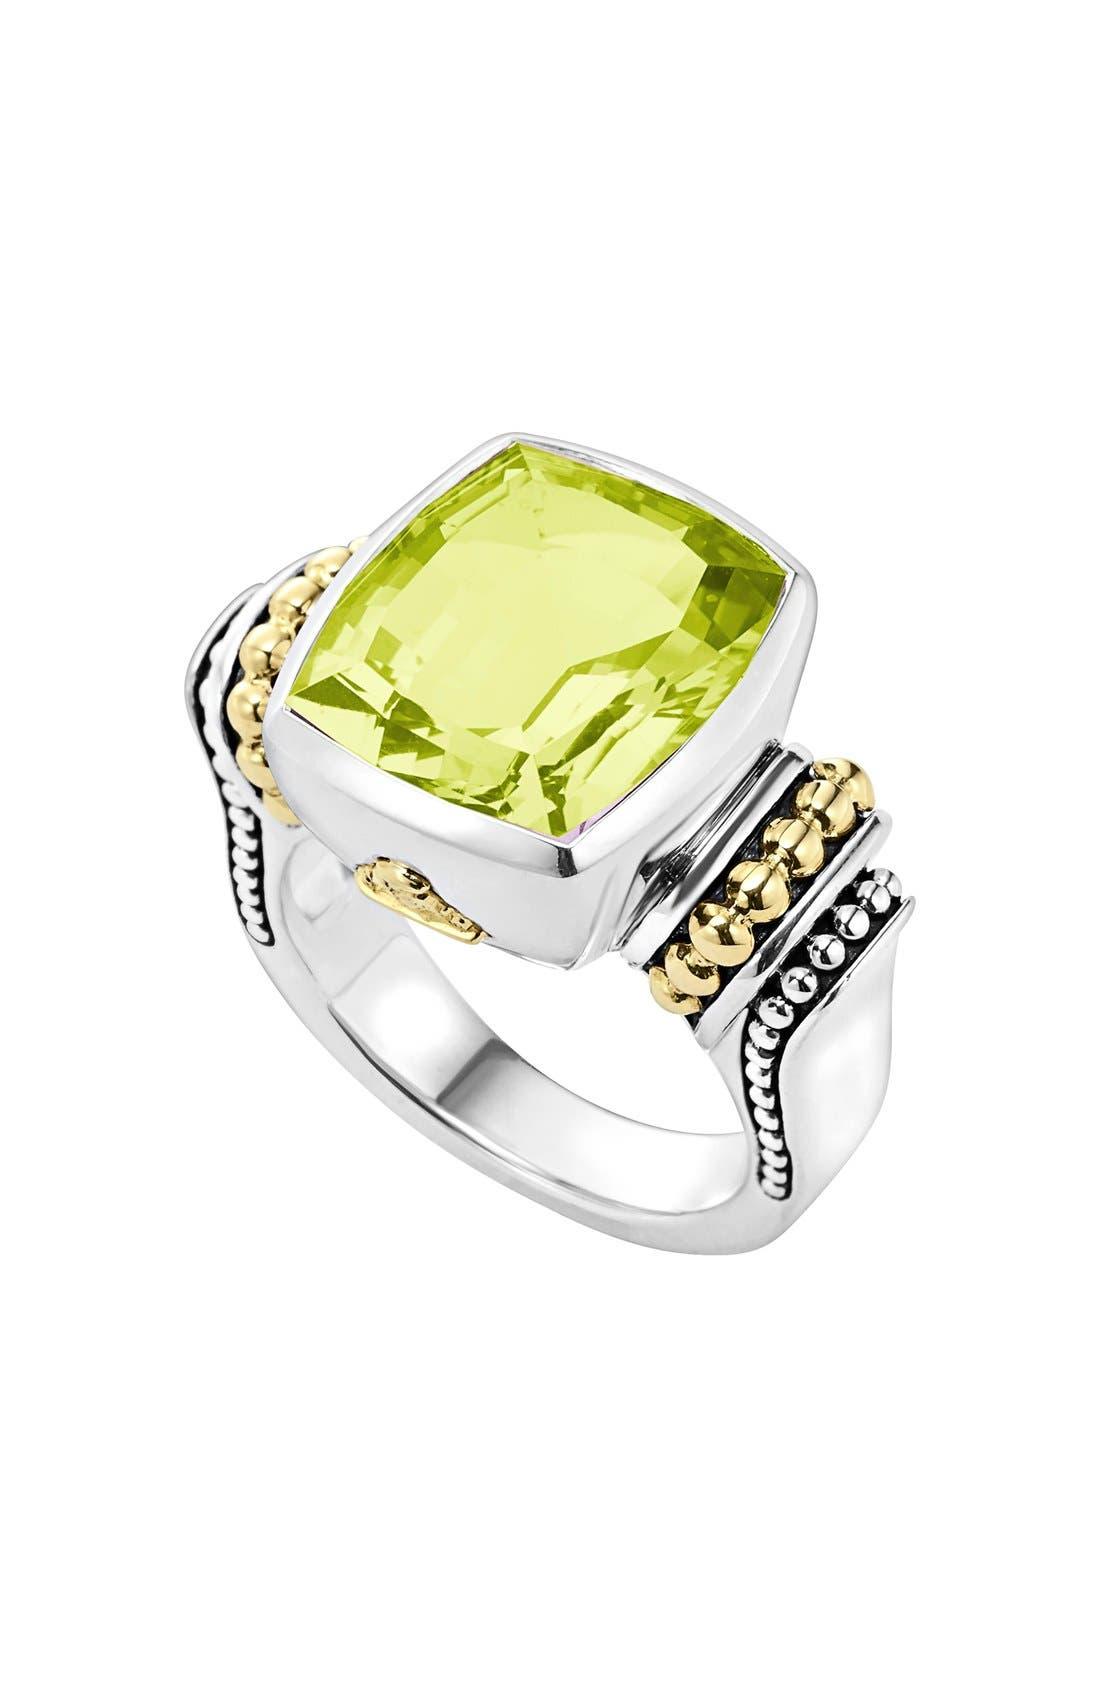 Main Image - LAGOS 'Caviar Color' Medium Semiprecious Stone Ring